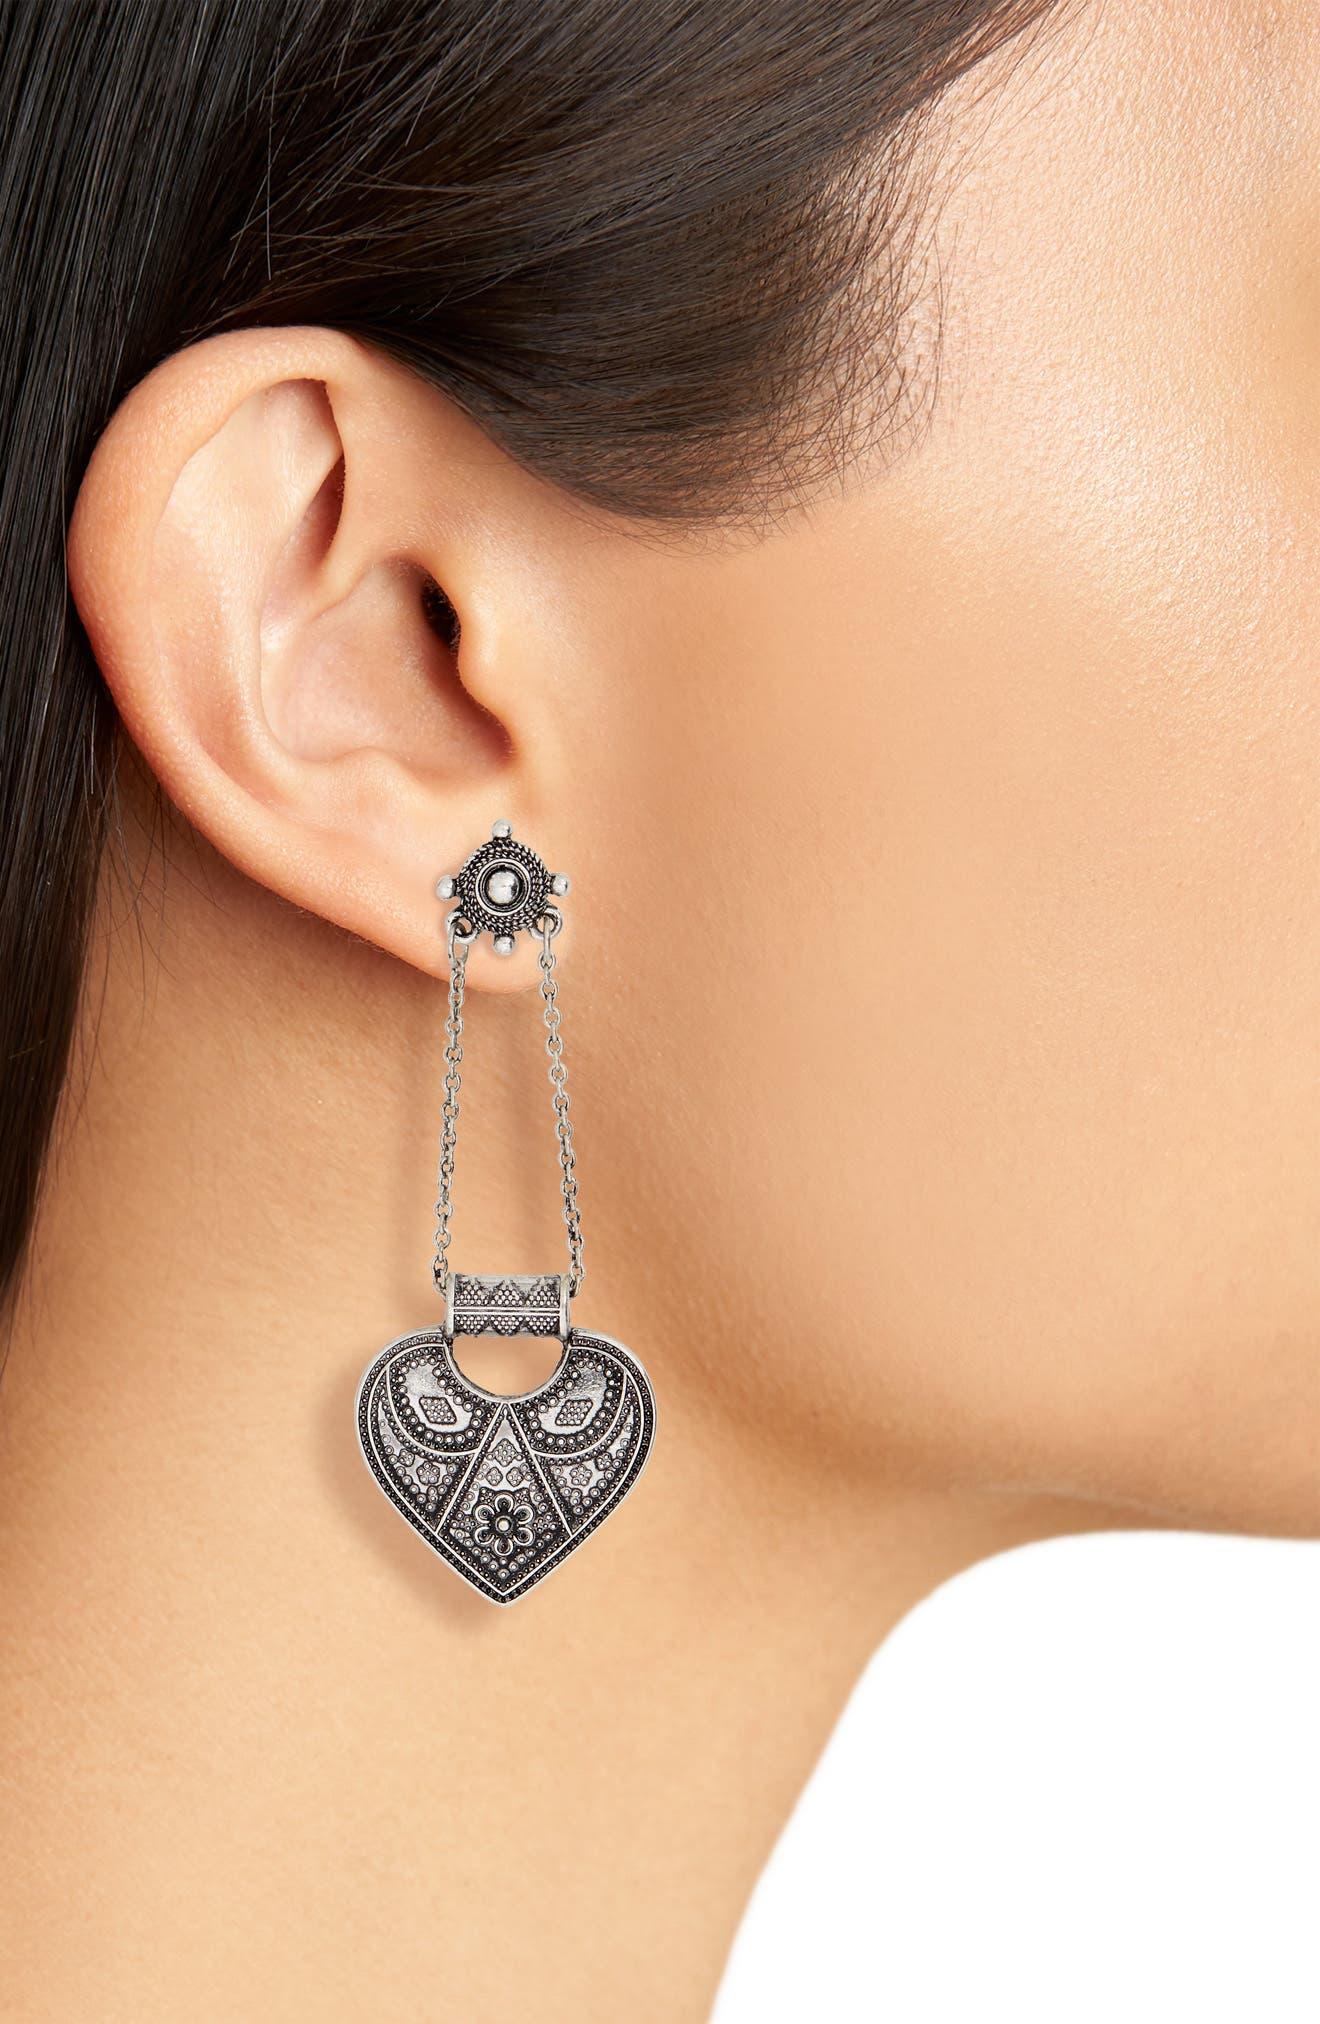 Heart Drop Earrings,                             Alternate thumbnail 2, color,                             Burnish Silver